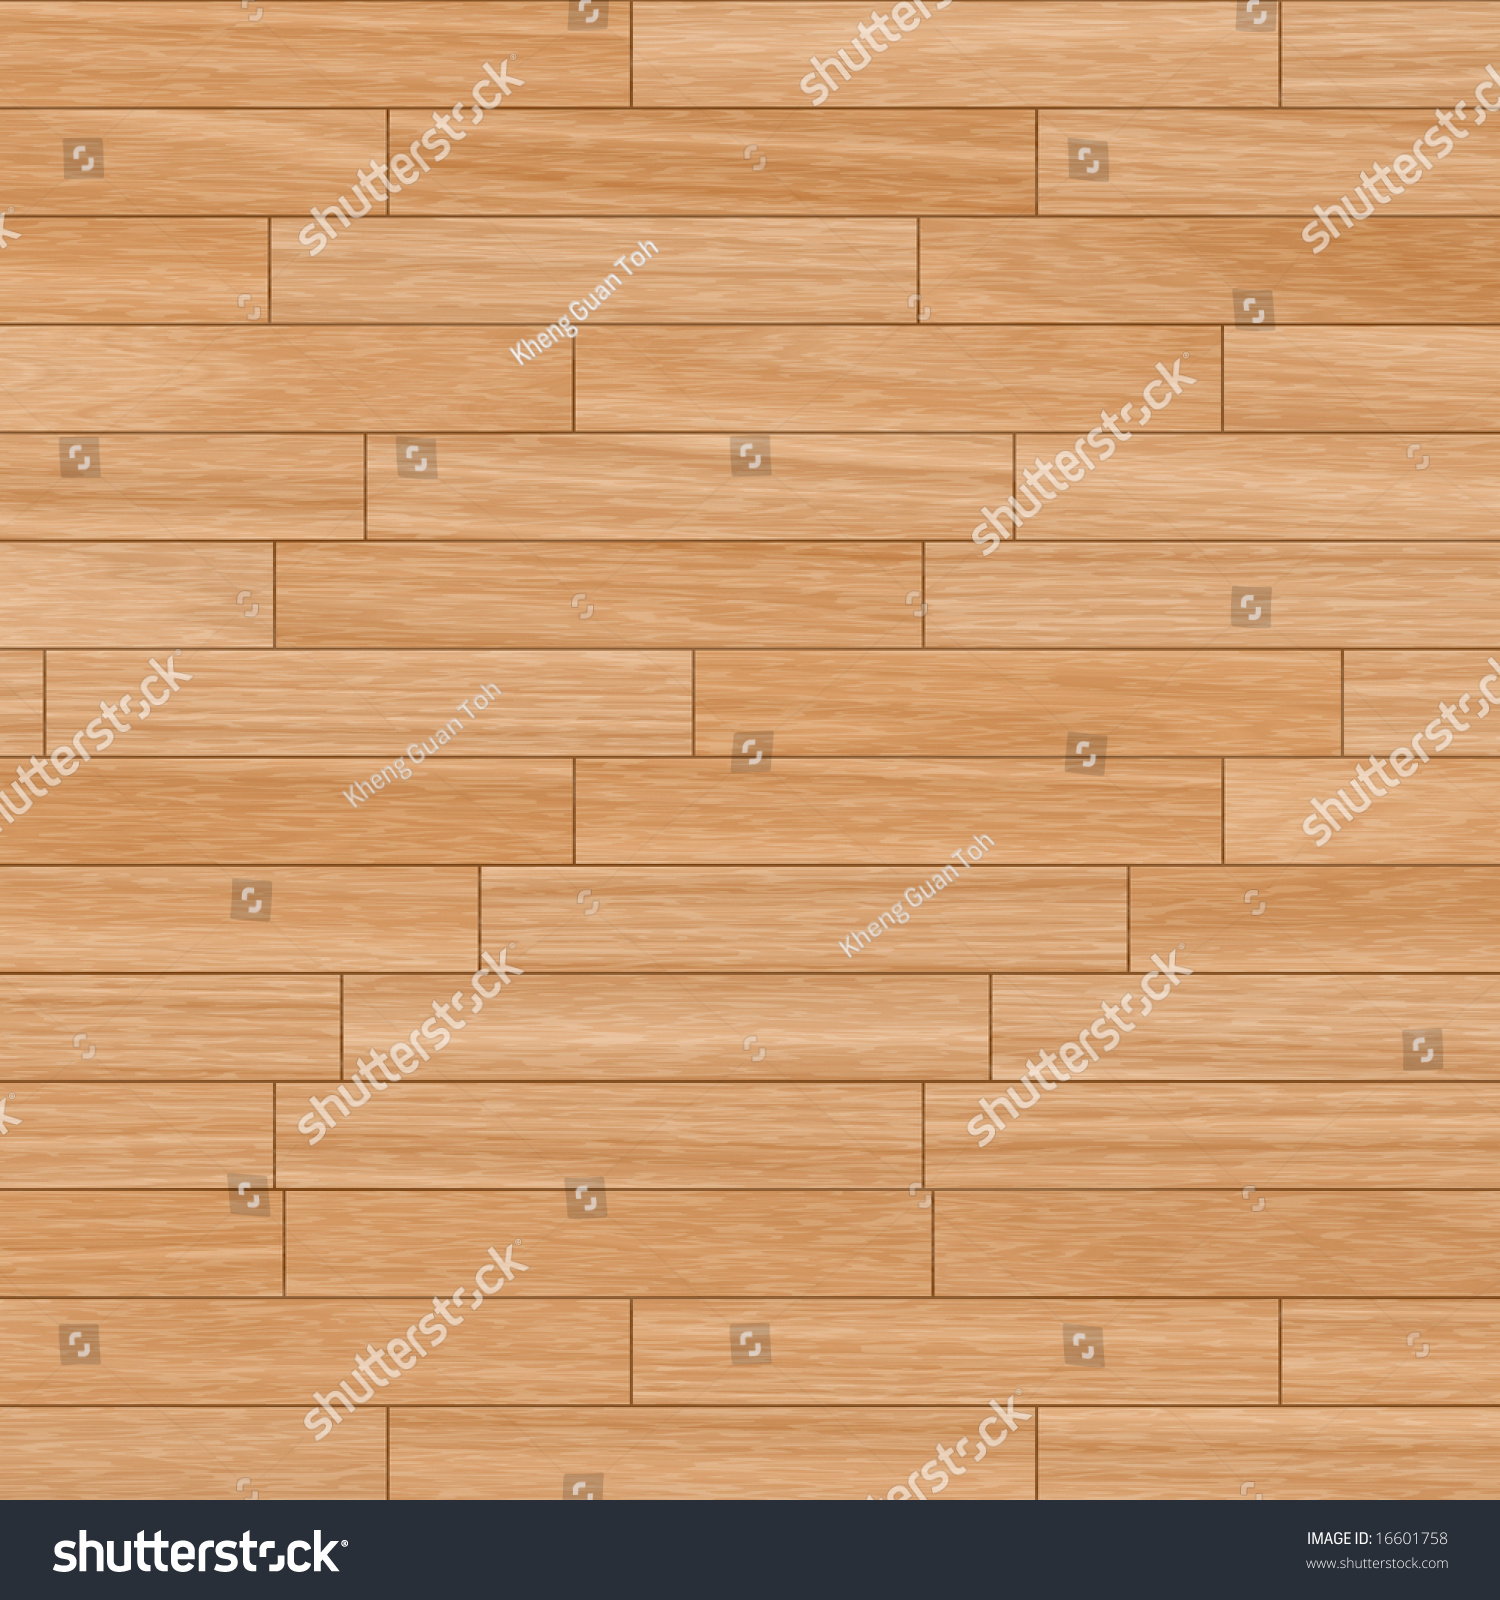 wooden parquet flooring surface pattern texture seamless. Black Bedroom Furniture Sets. Home Design Ideas